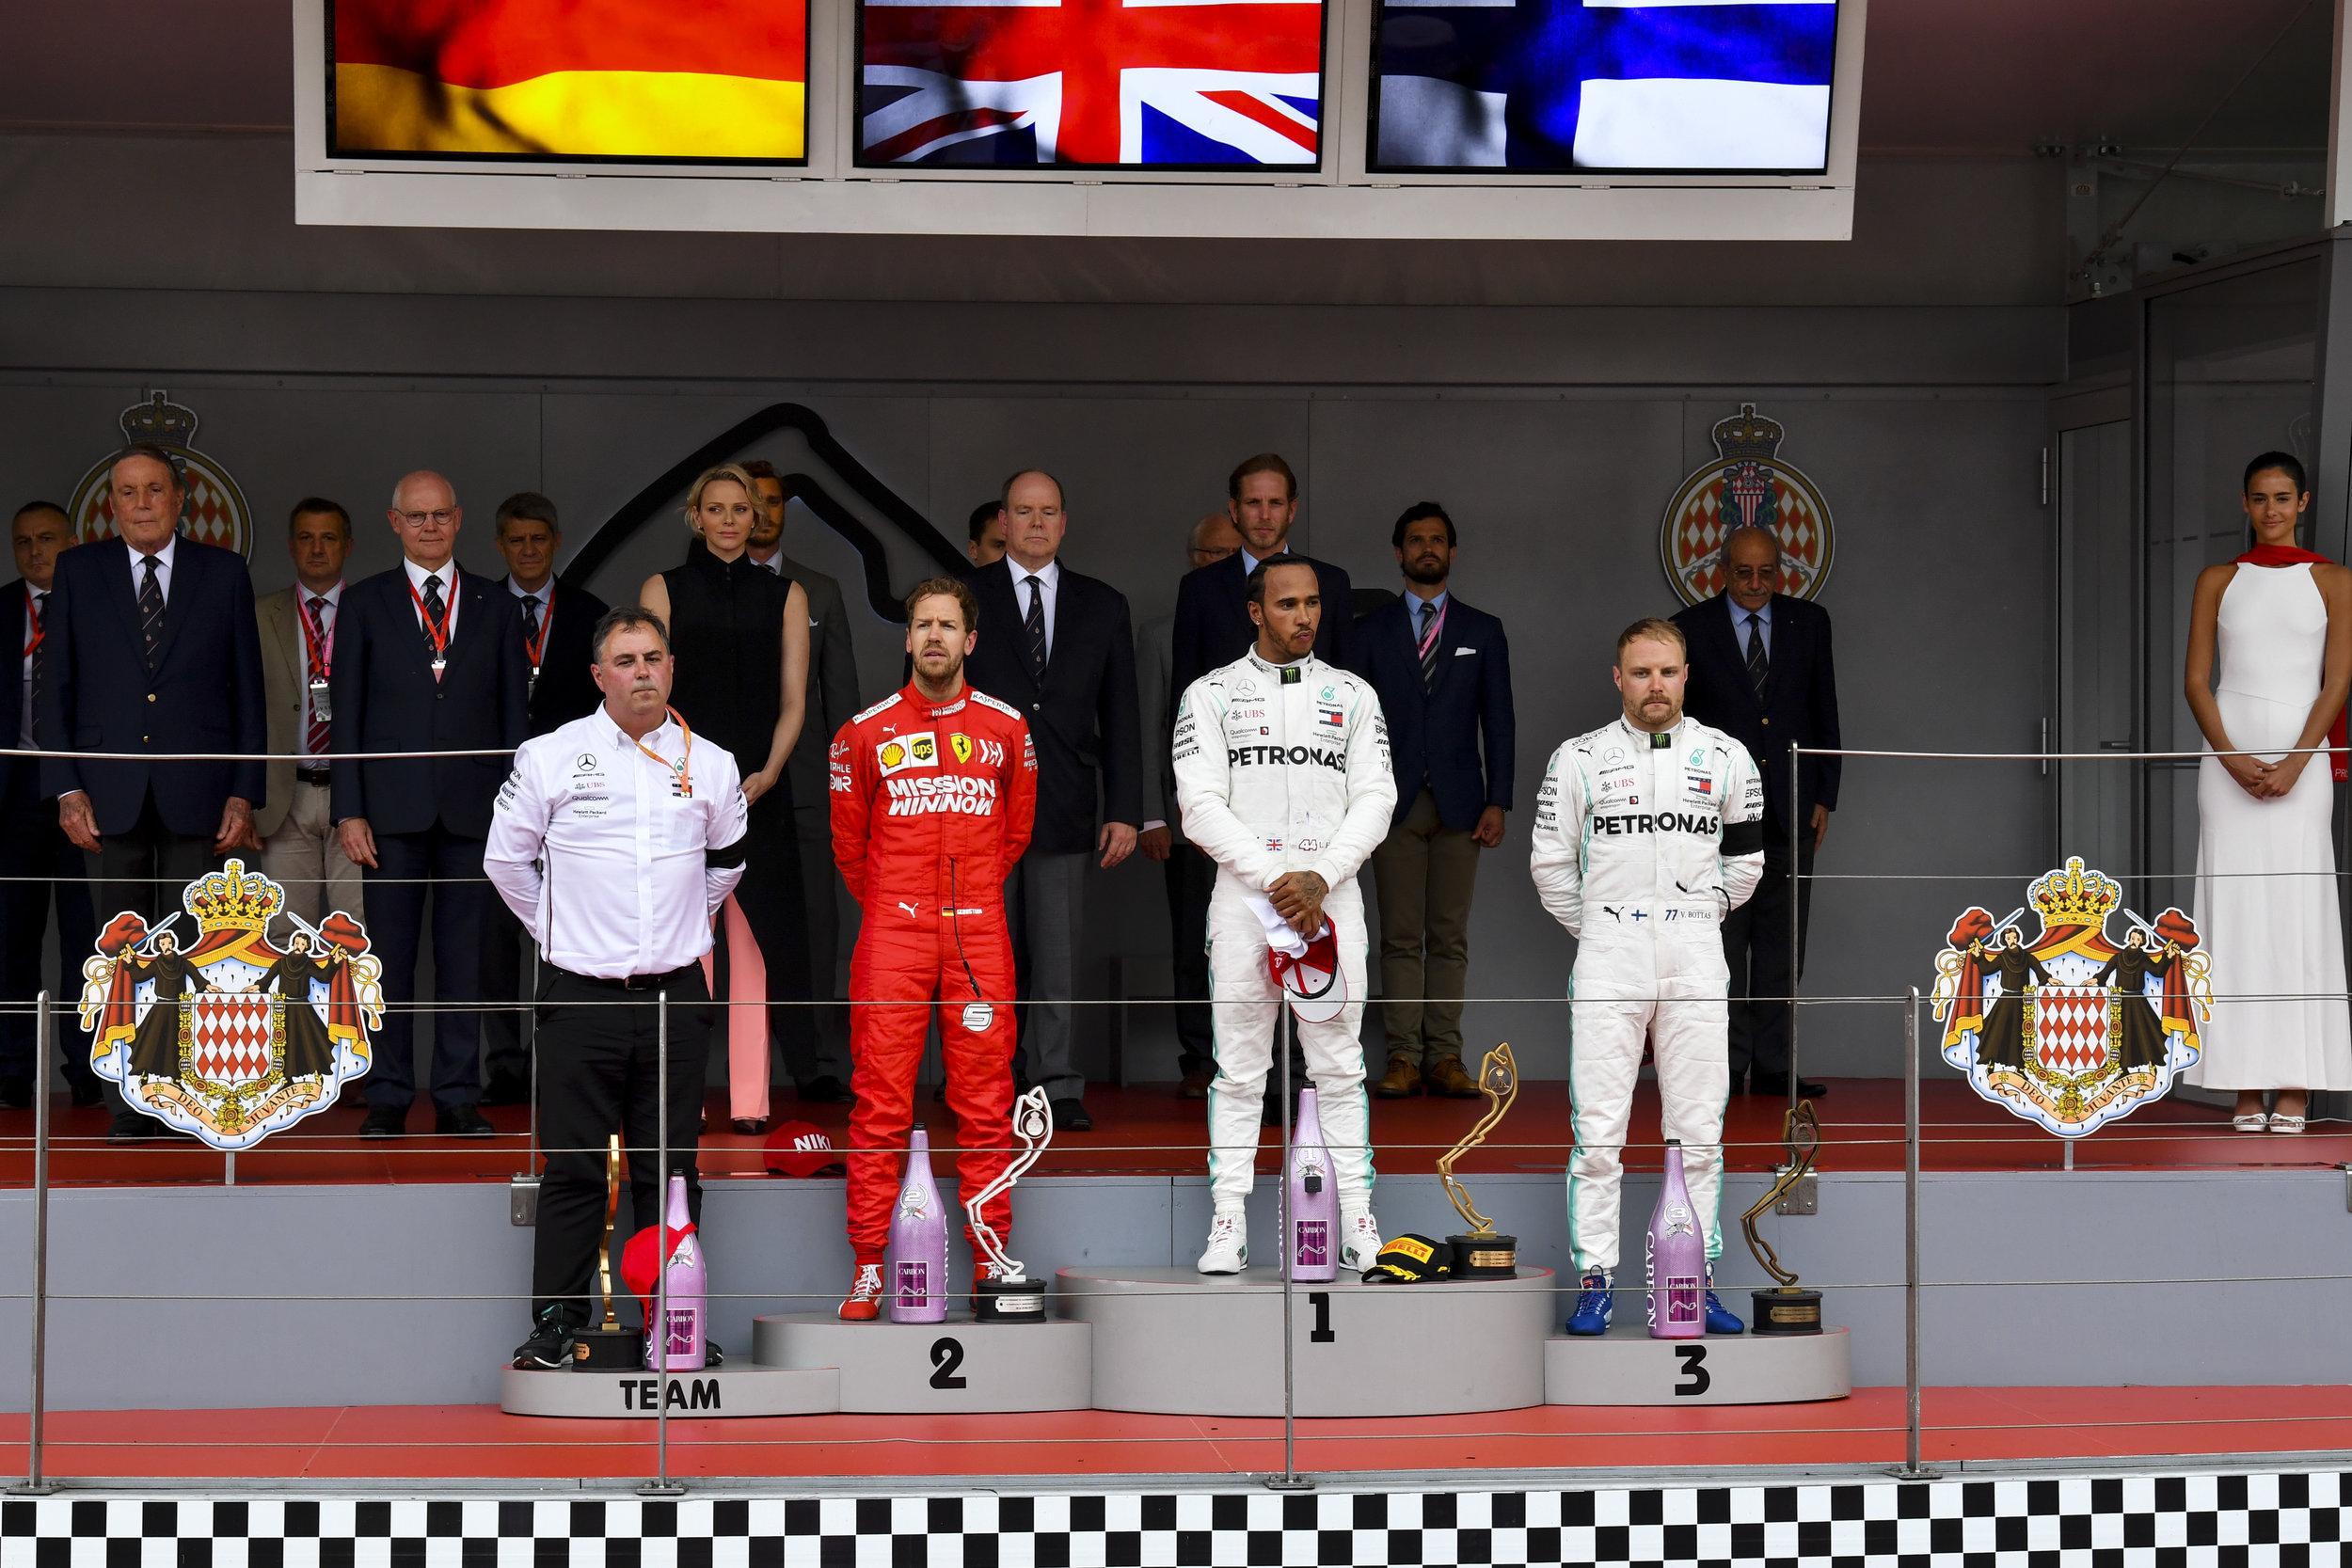 The 2019 Monaco Grand Prix Podium